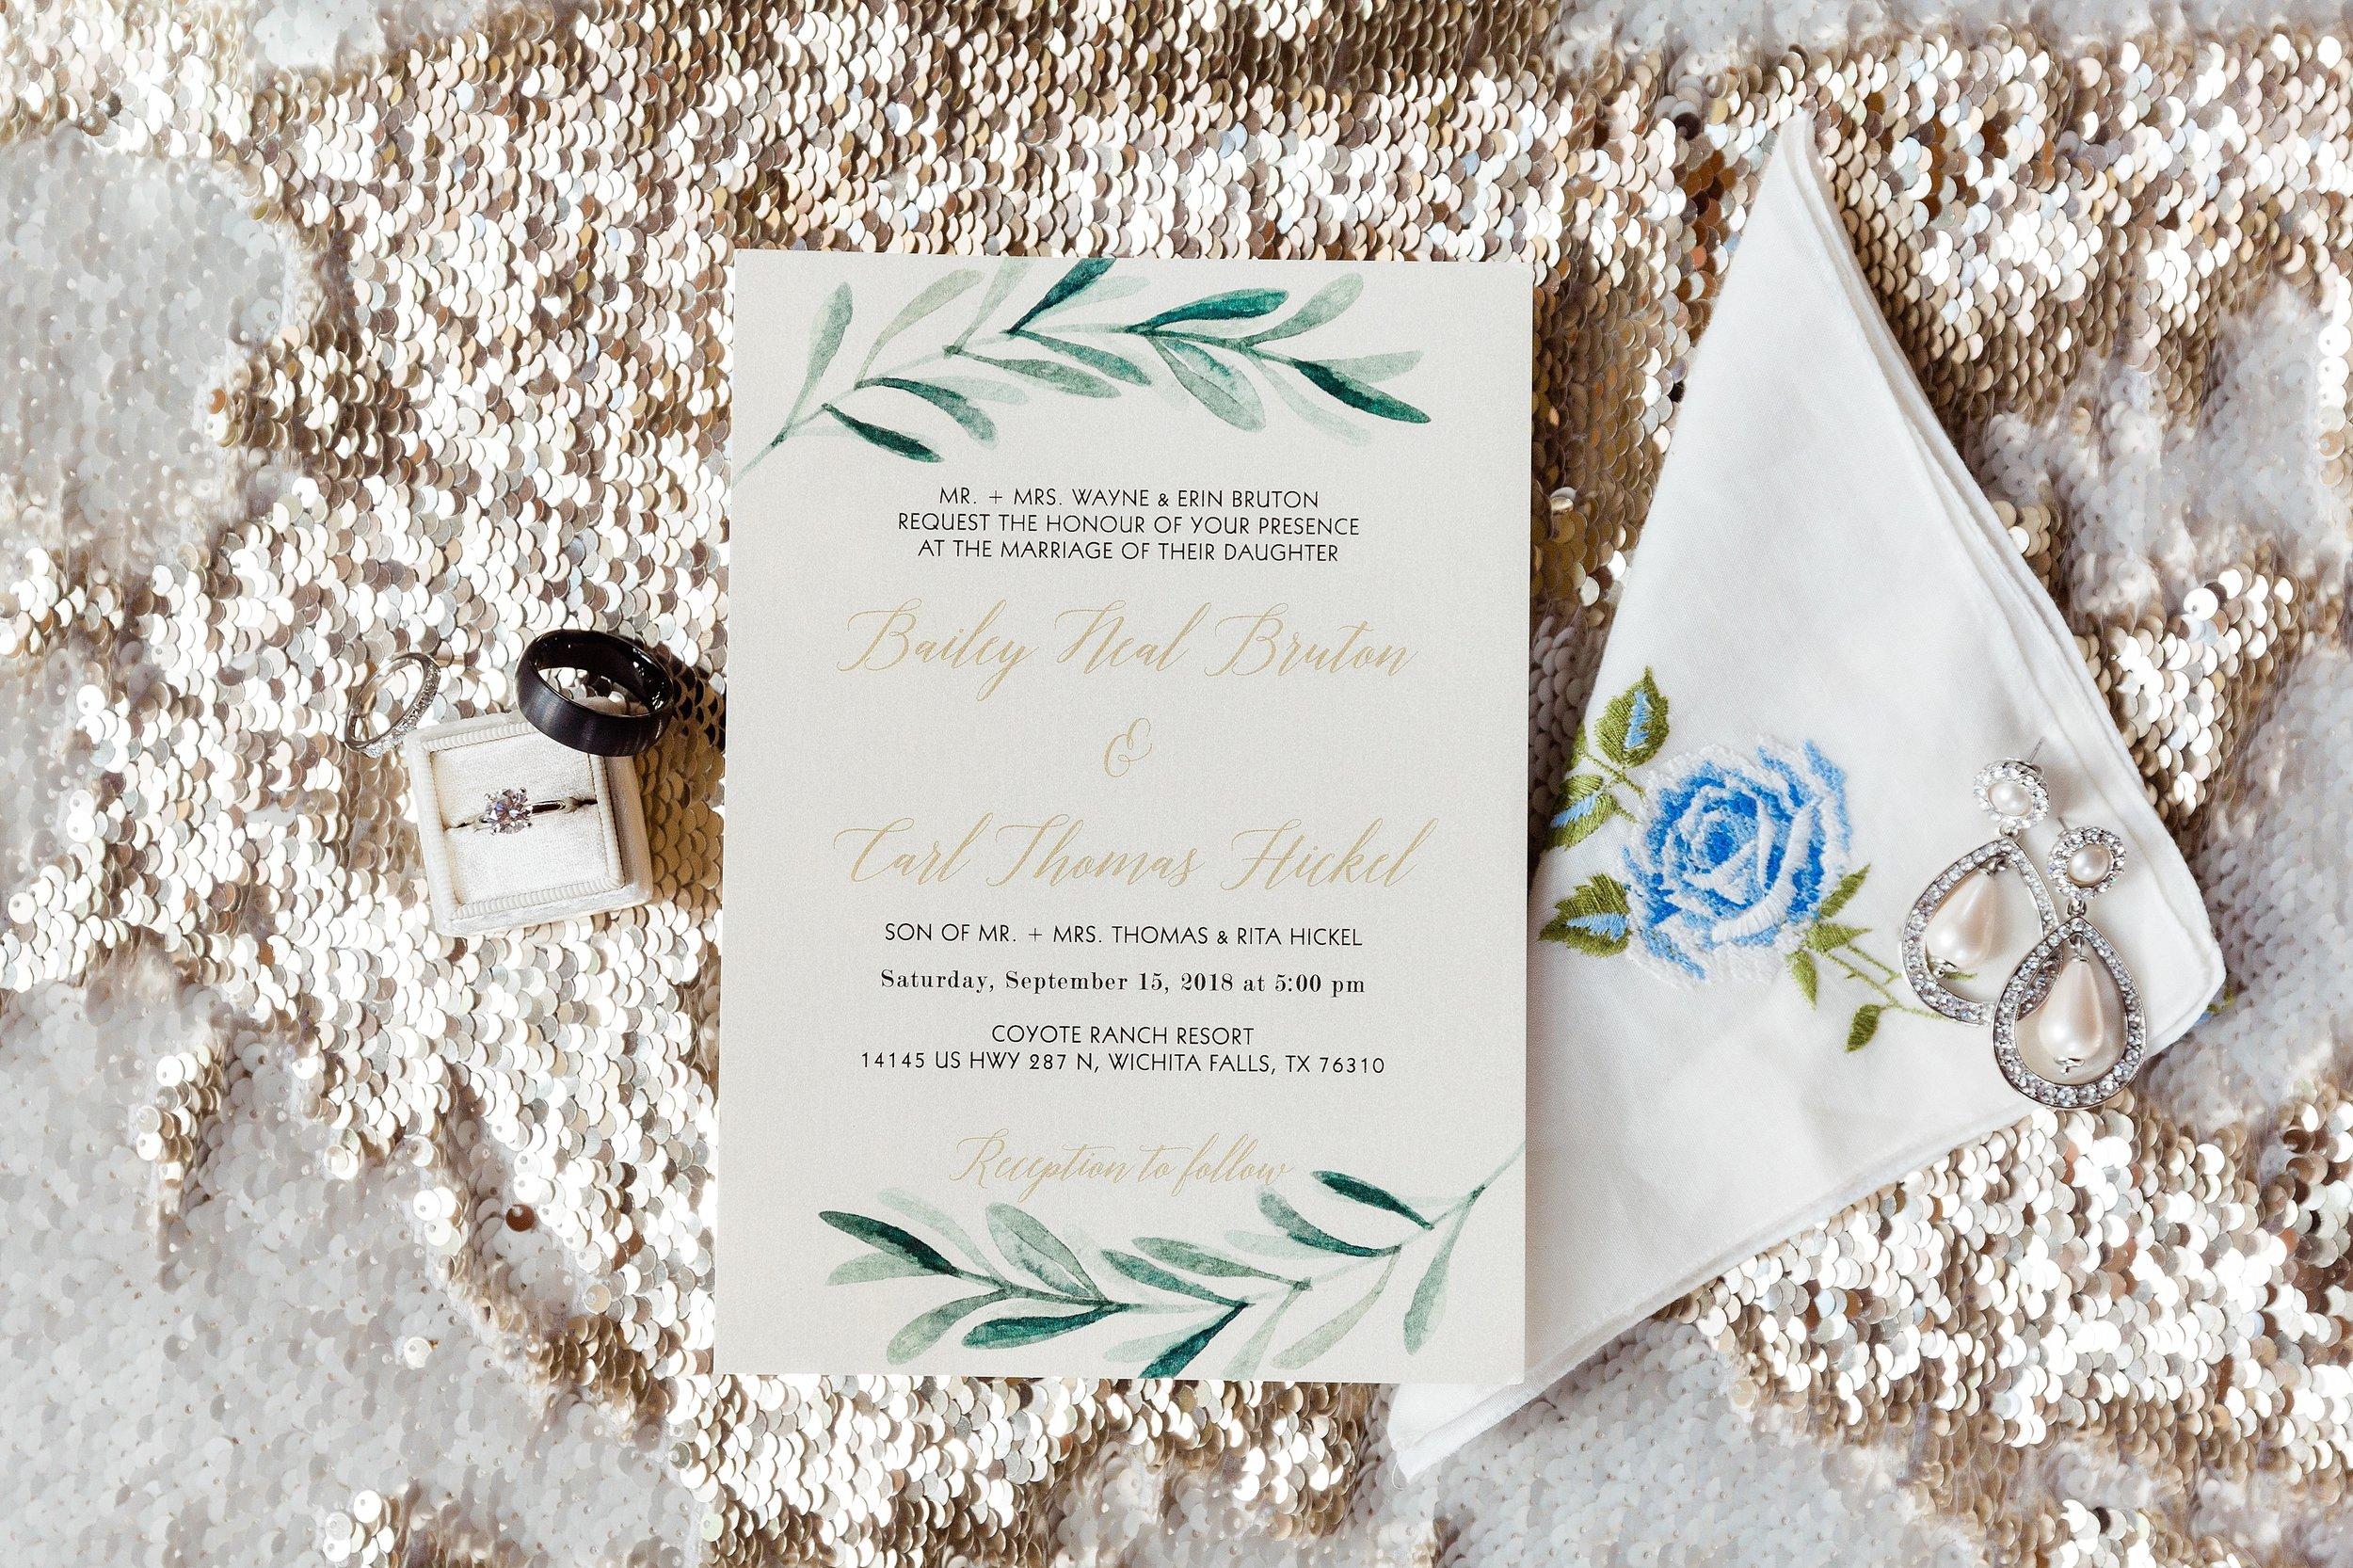 bailey-and-carl-coyote-ranch-resort-wedding-photographer-wichita-falls-texas-destination-wedding-0002.jpg